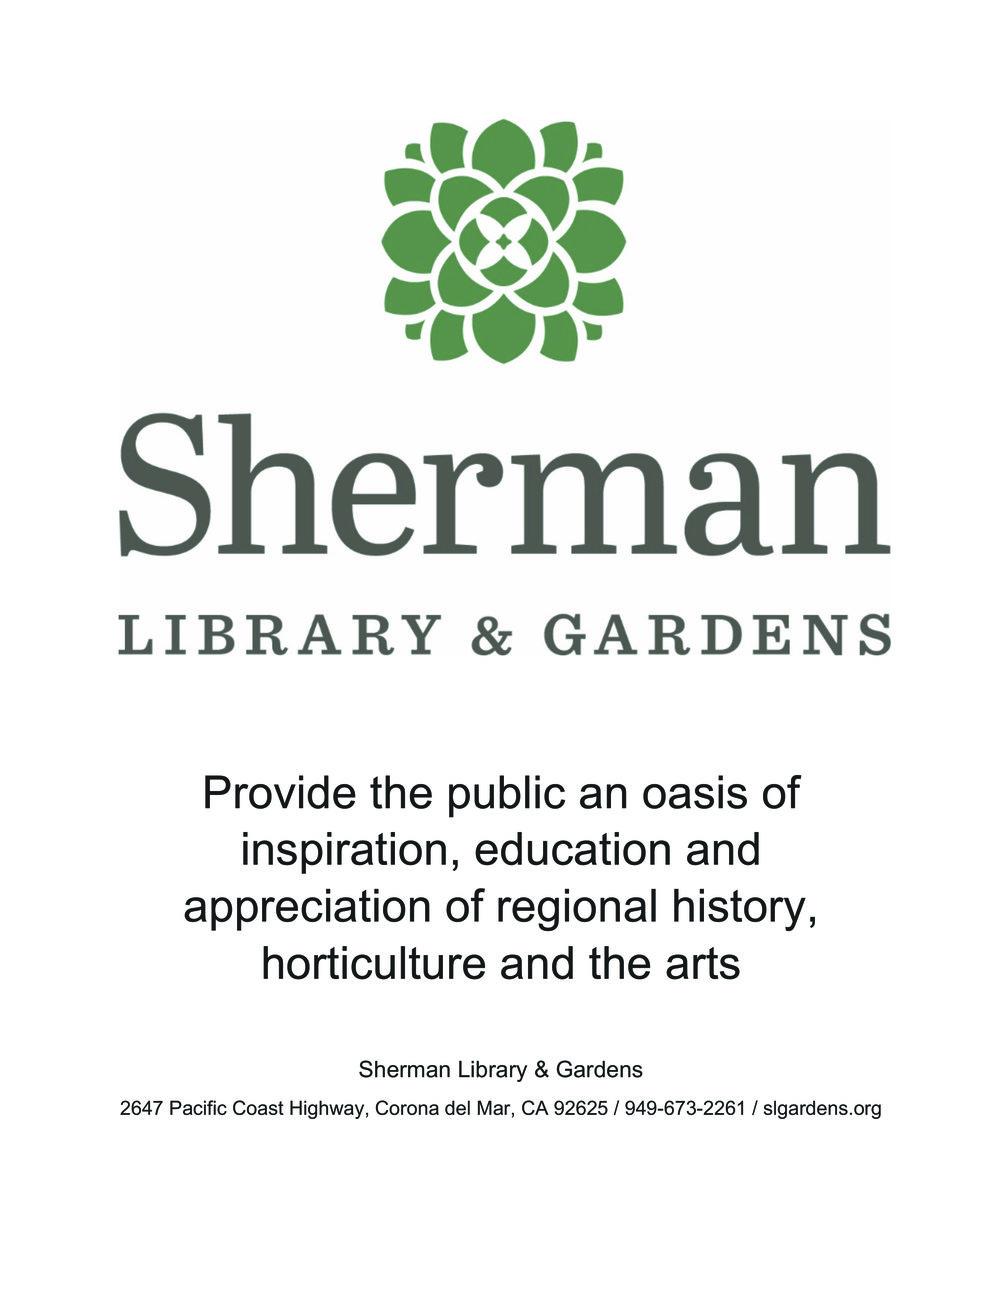 Microsoft Word - Sherman gardens new logo.docx